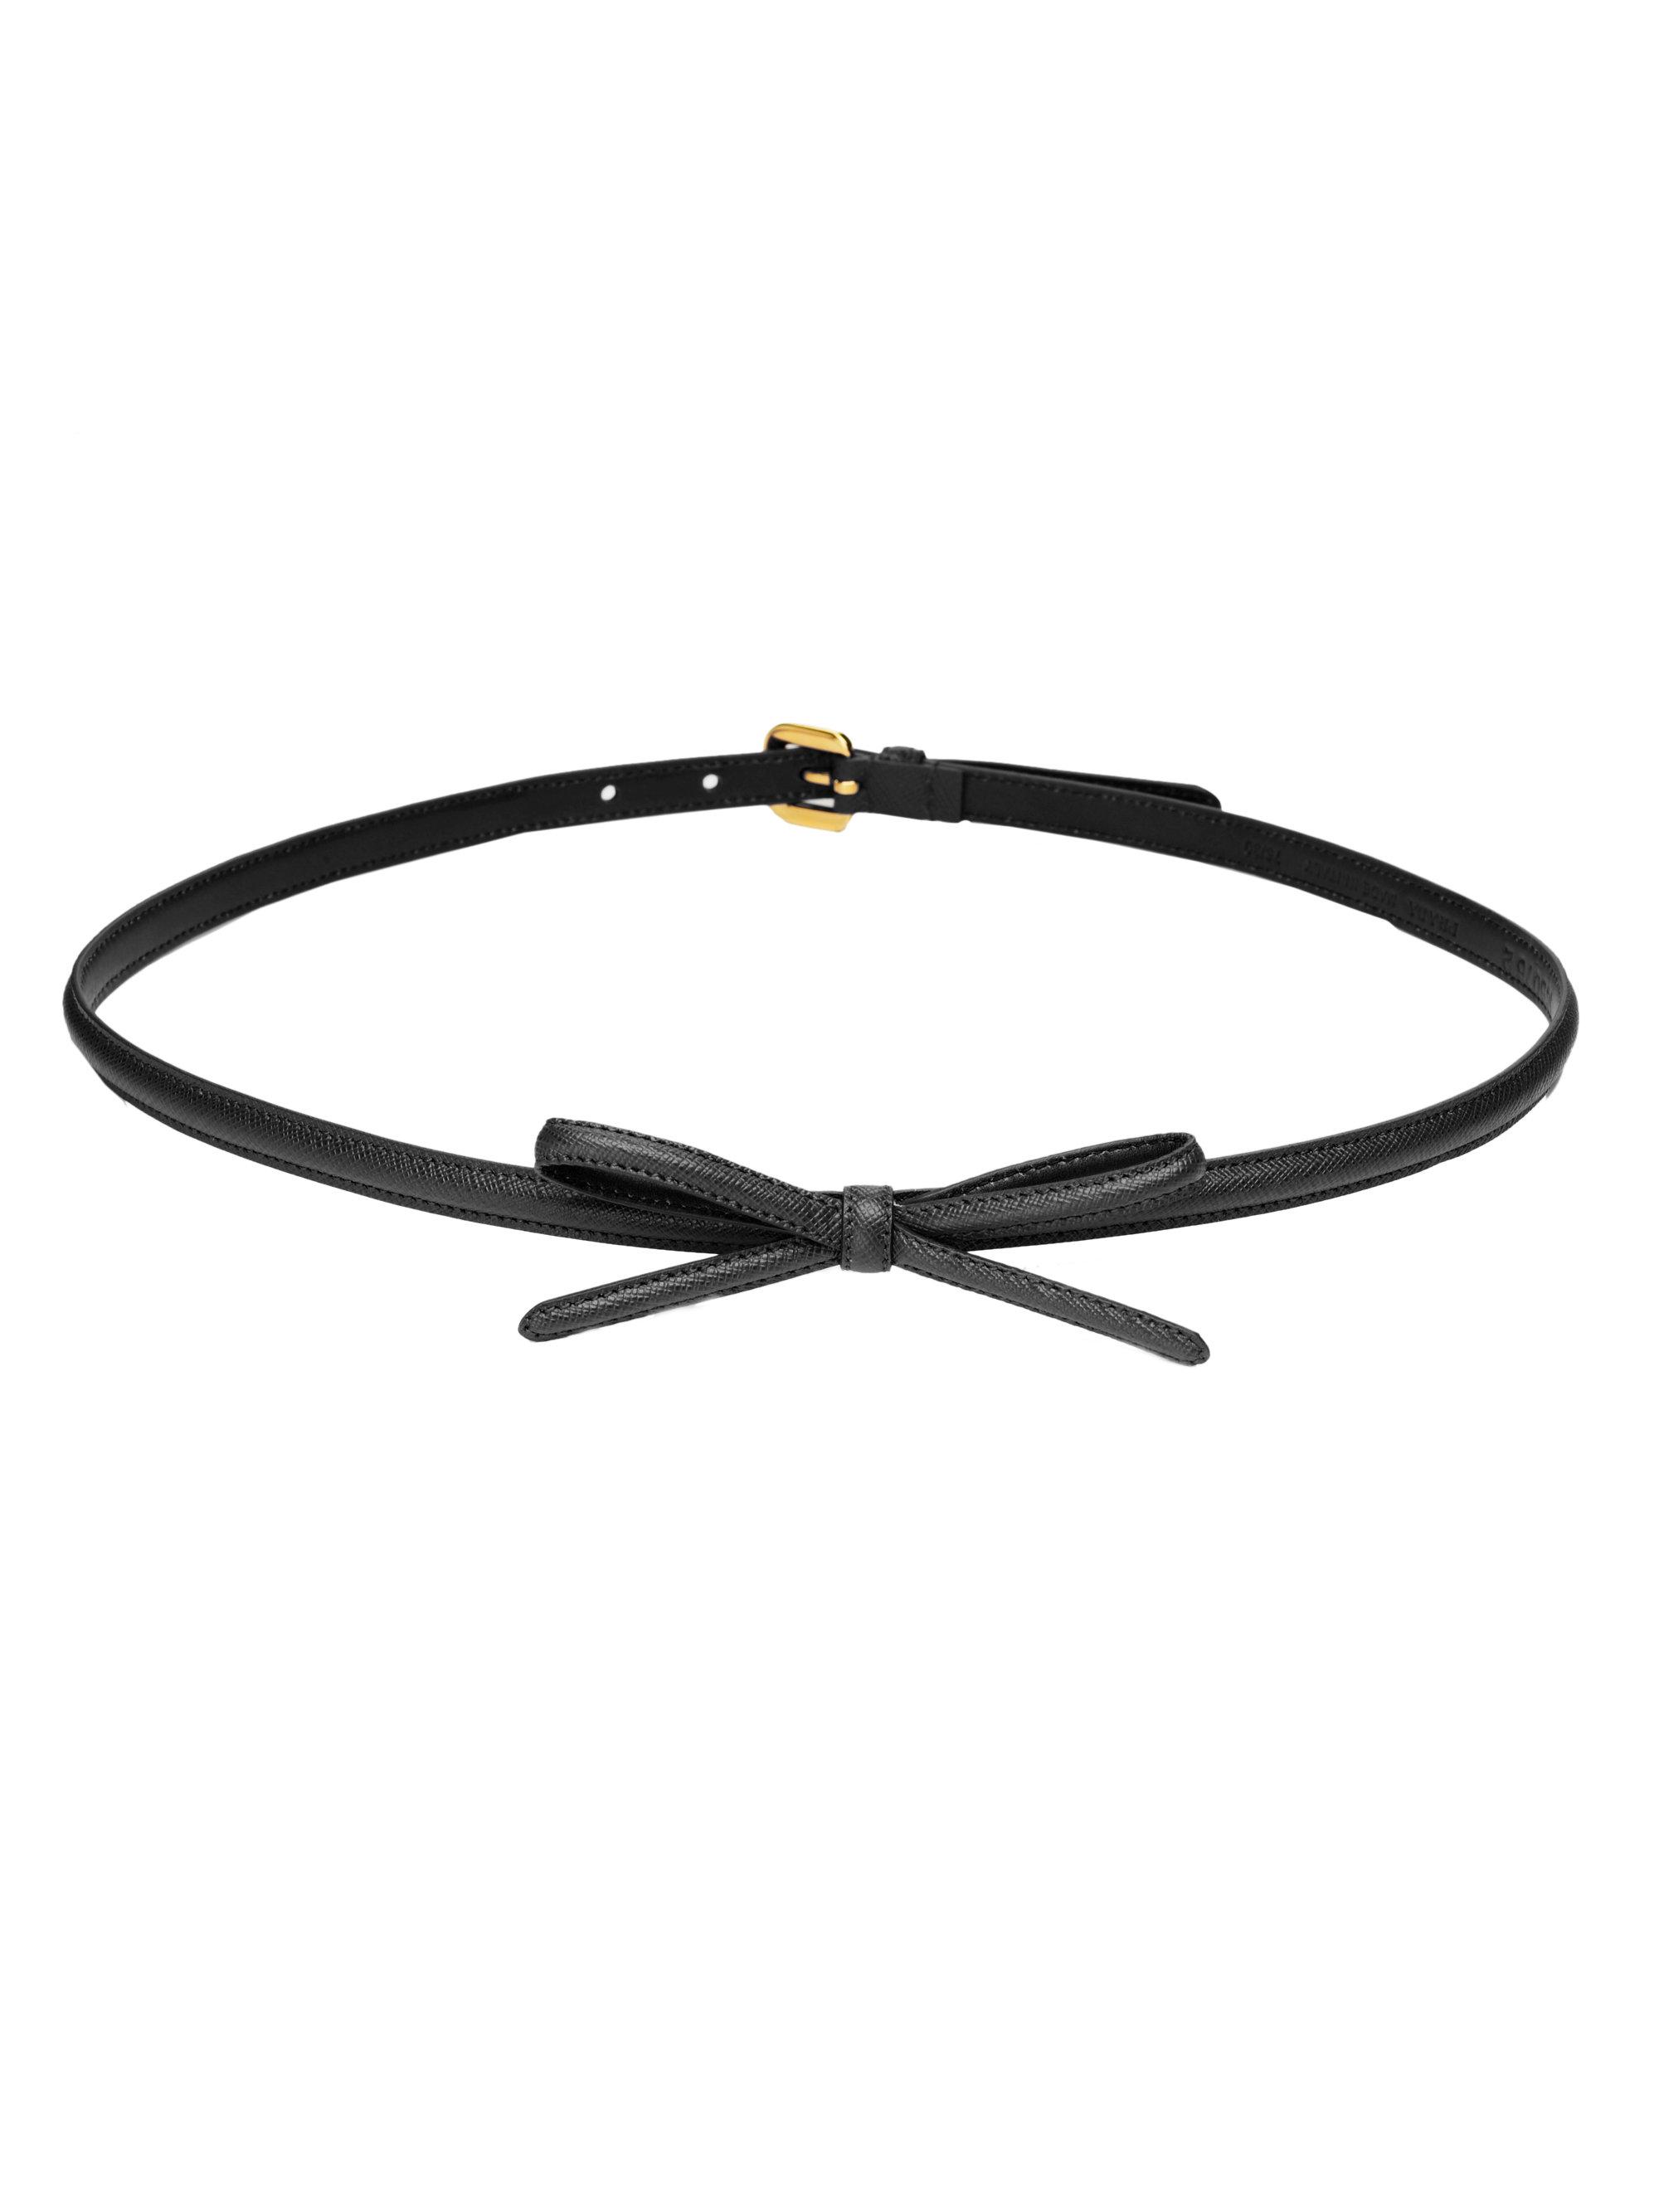 Prada Saffiano Bow Belt In Black